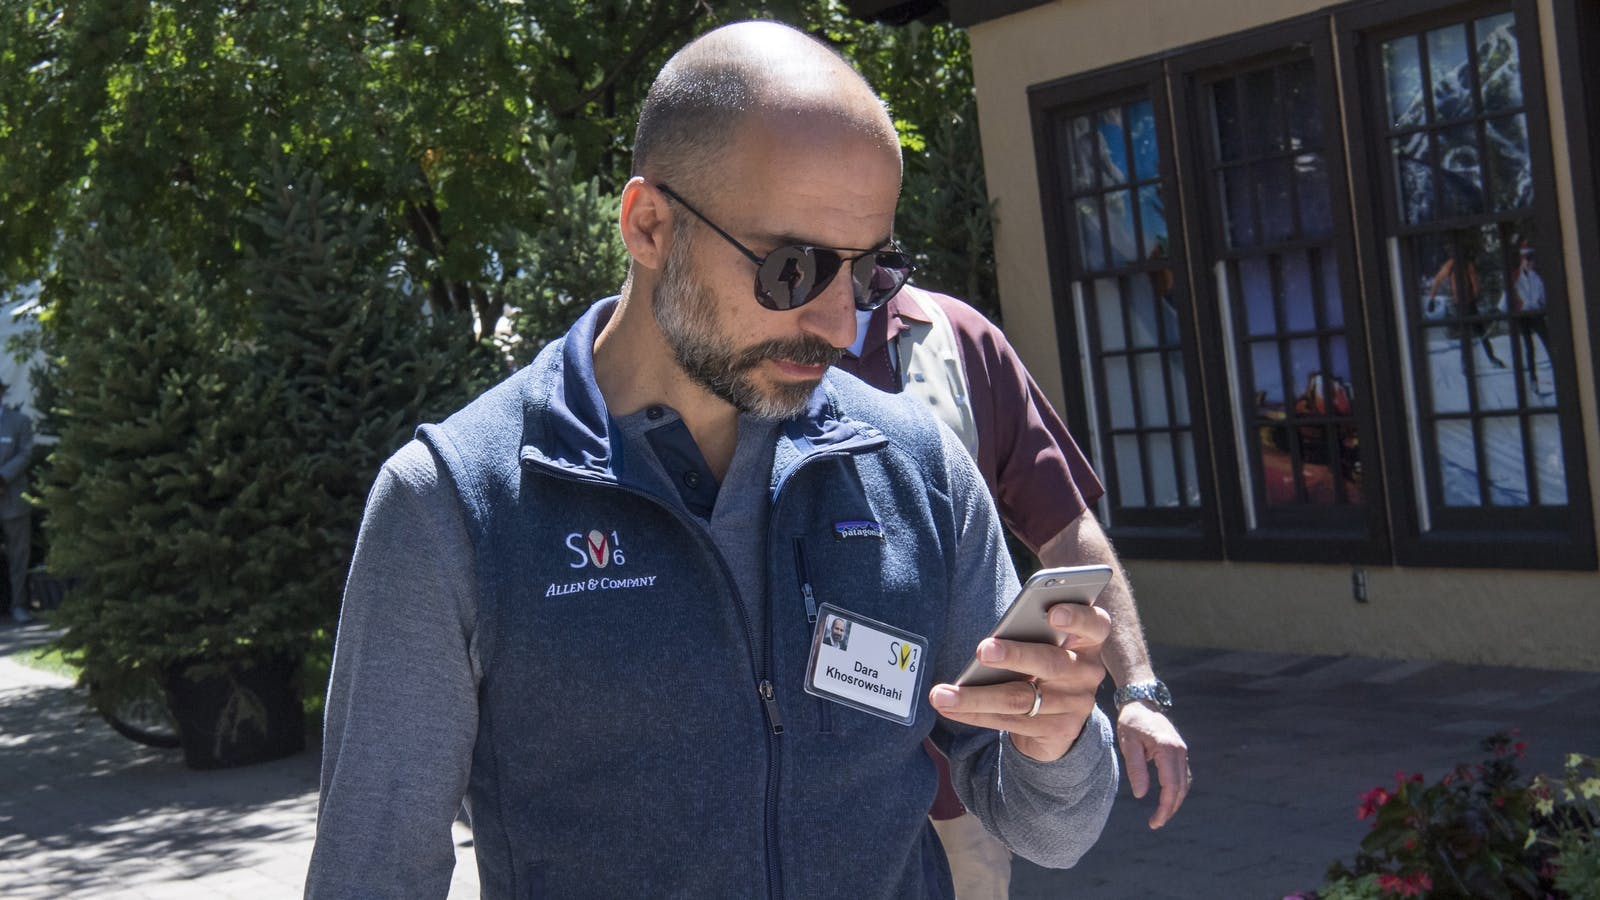 Uber's new CEO Dara Khosrowshahi. Photo by Bloomberg.